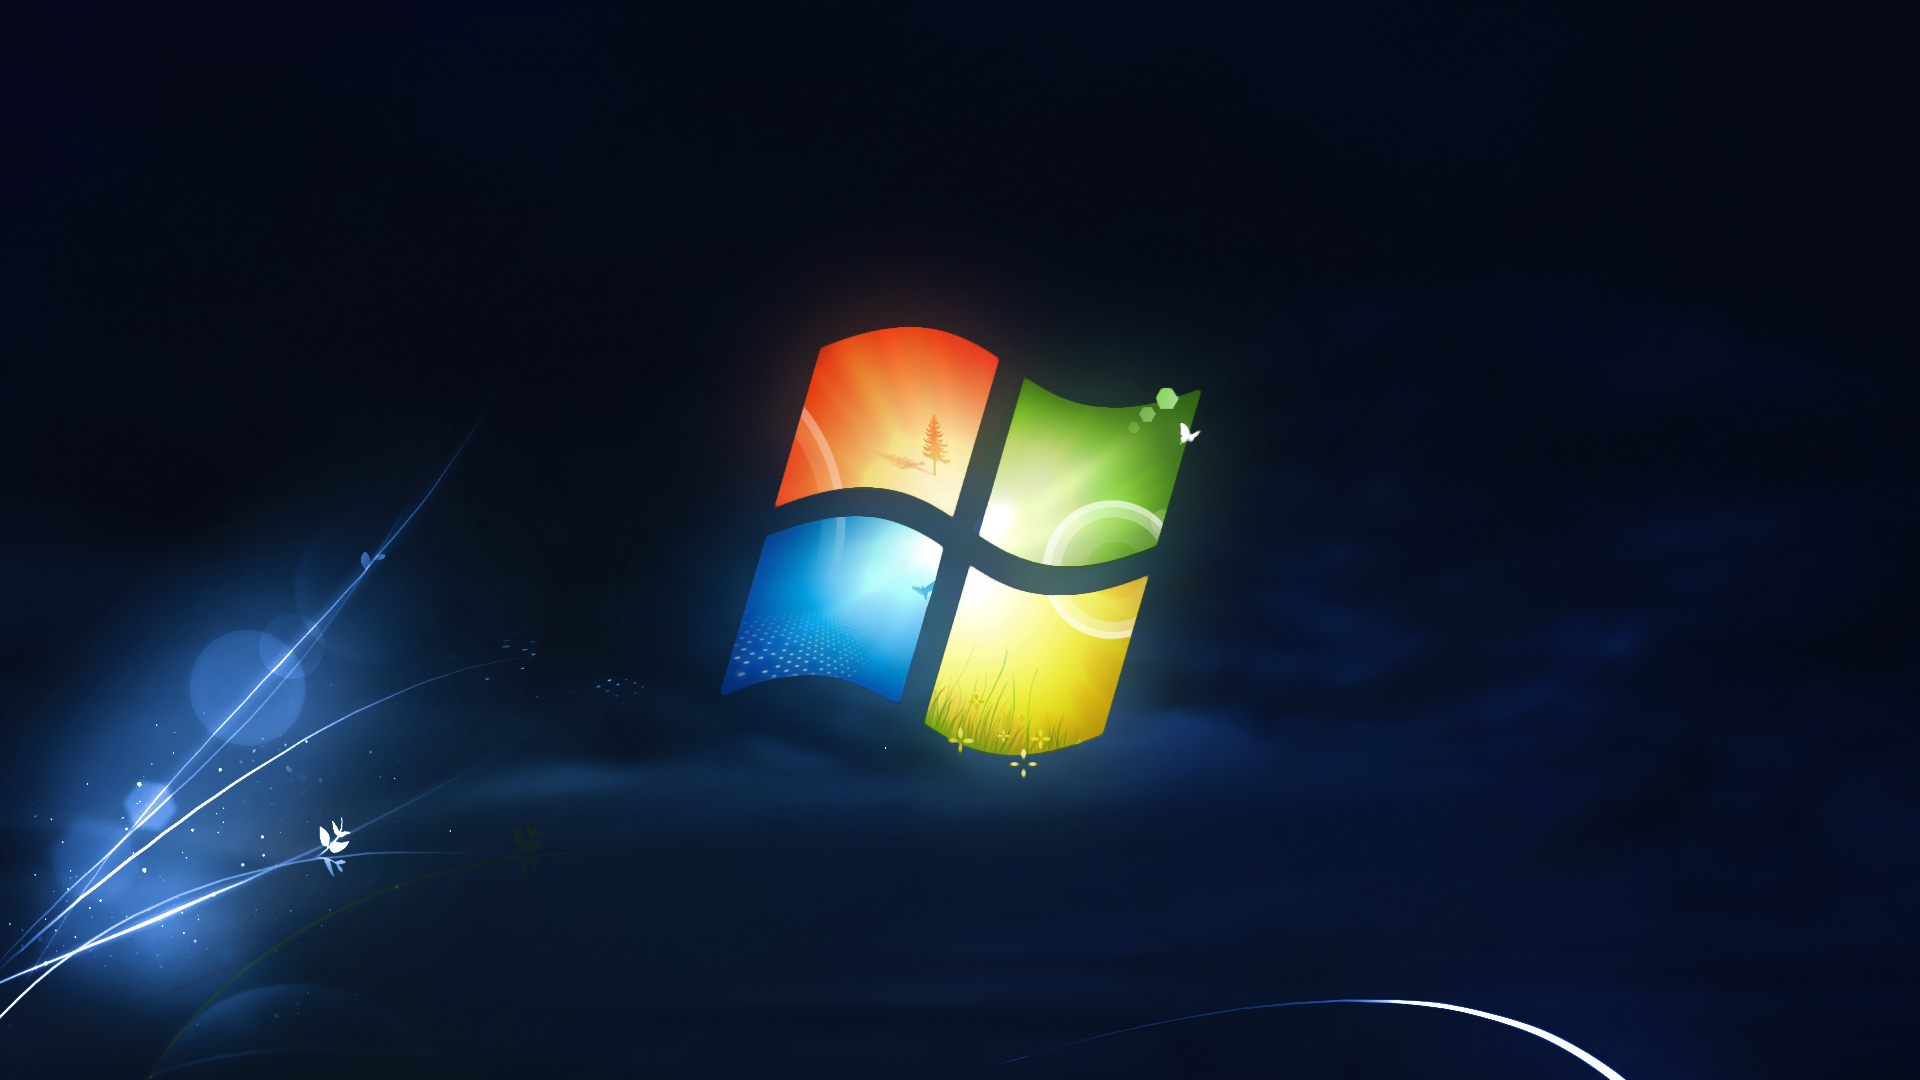 Microsoft Windows Wallpaper 1920x1080 Microsoft Windows Logos 1920x1080